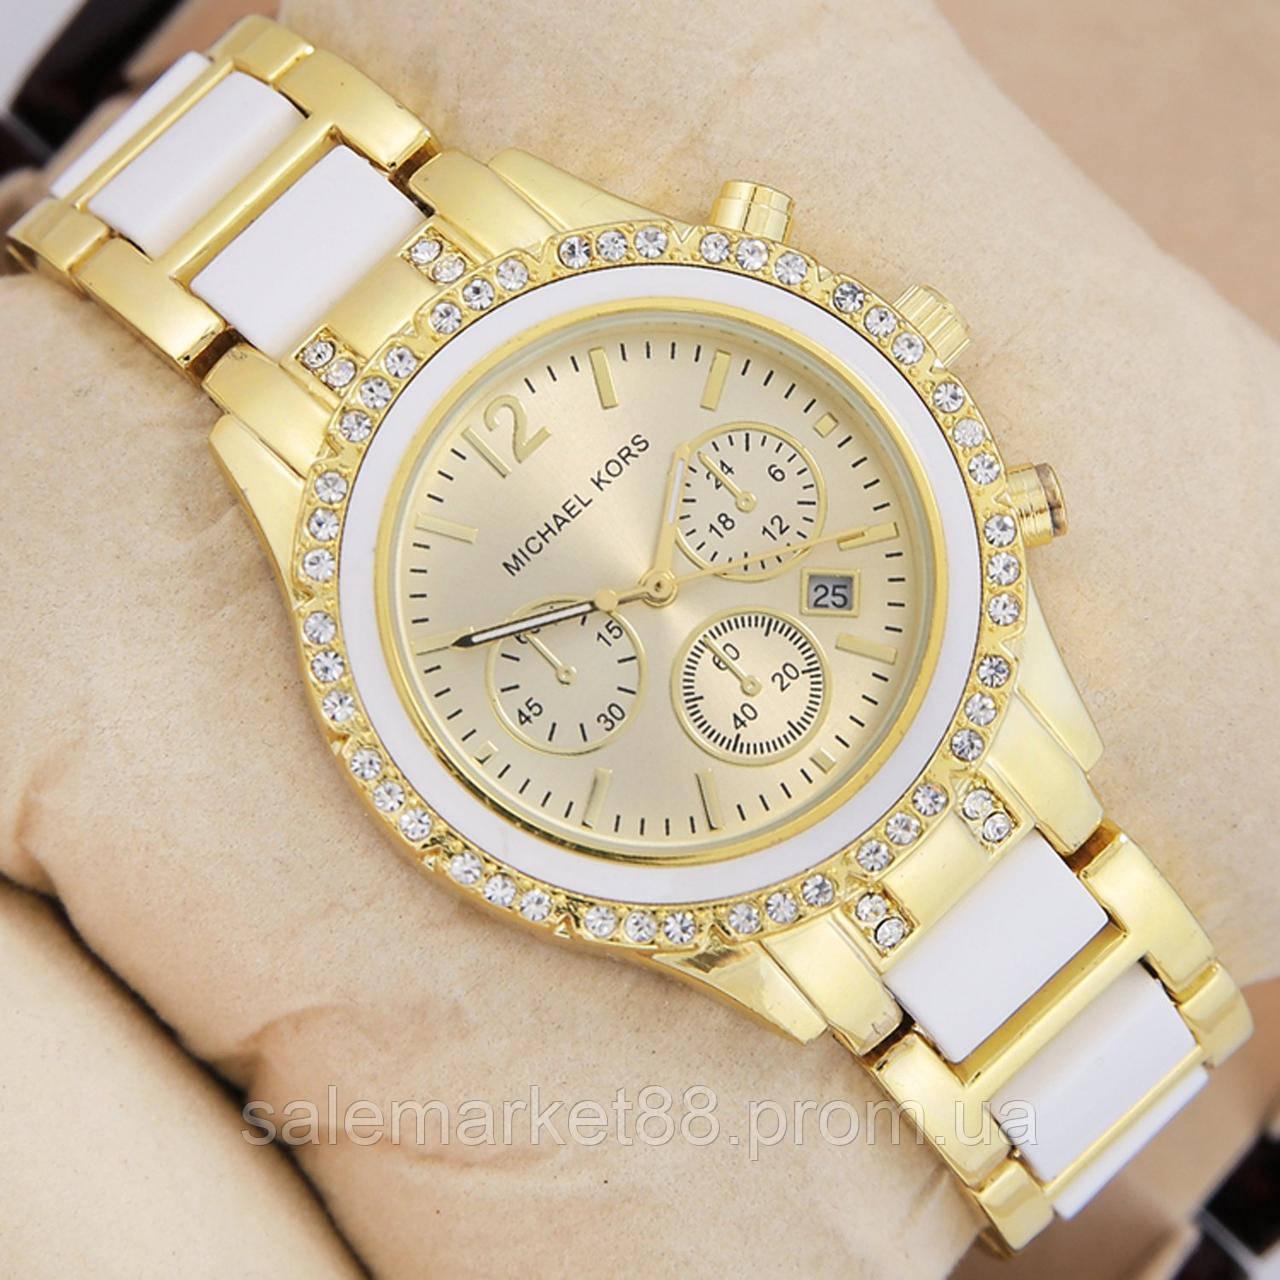 Michael Kors 10203 Crystal Gold-White-Gold